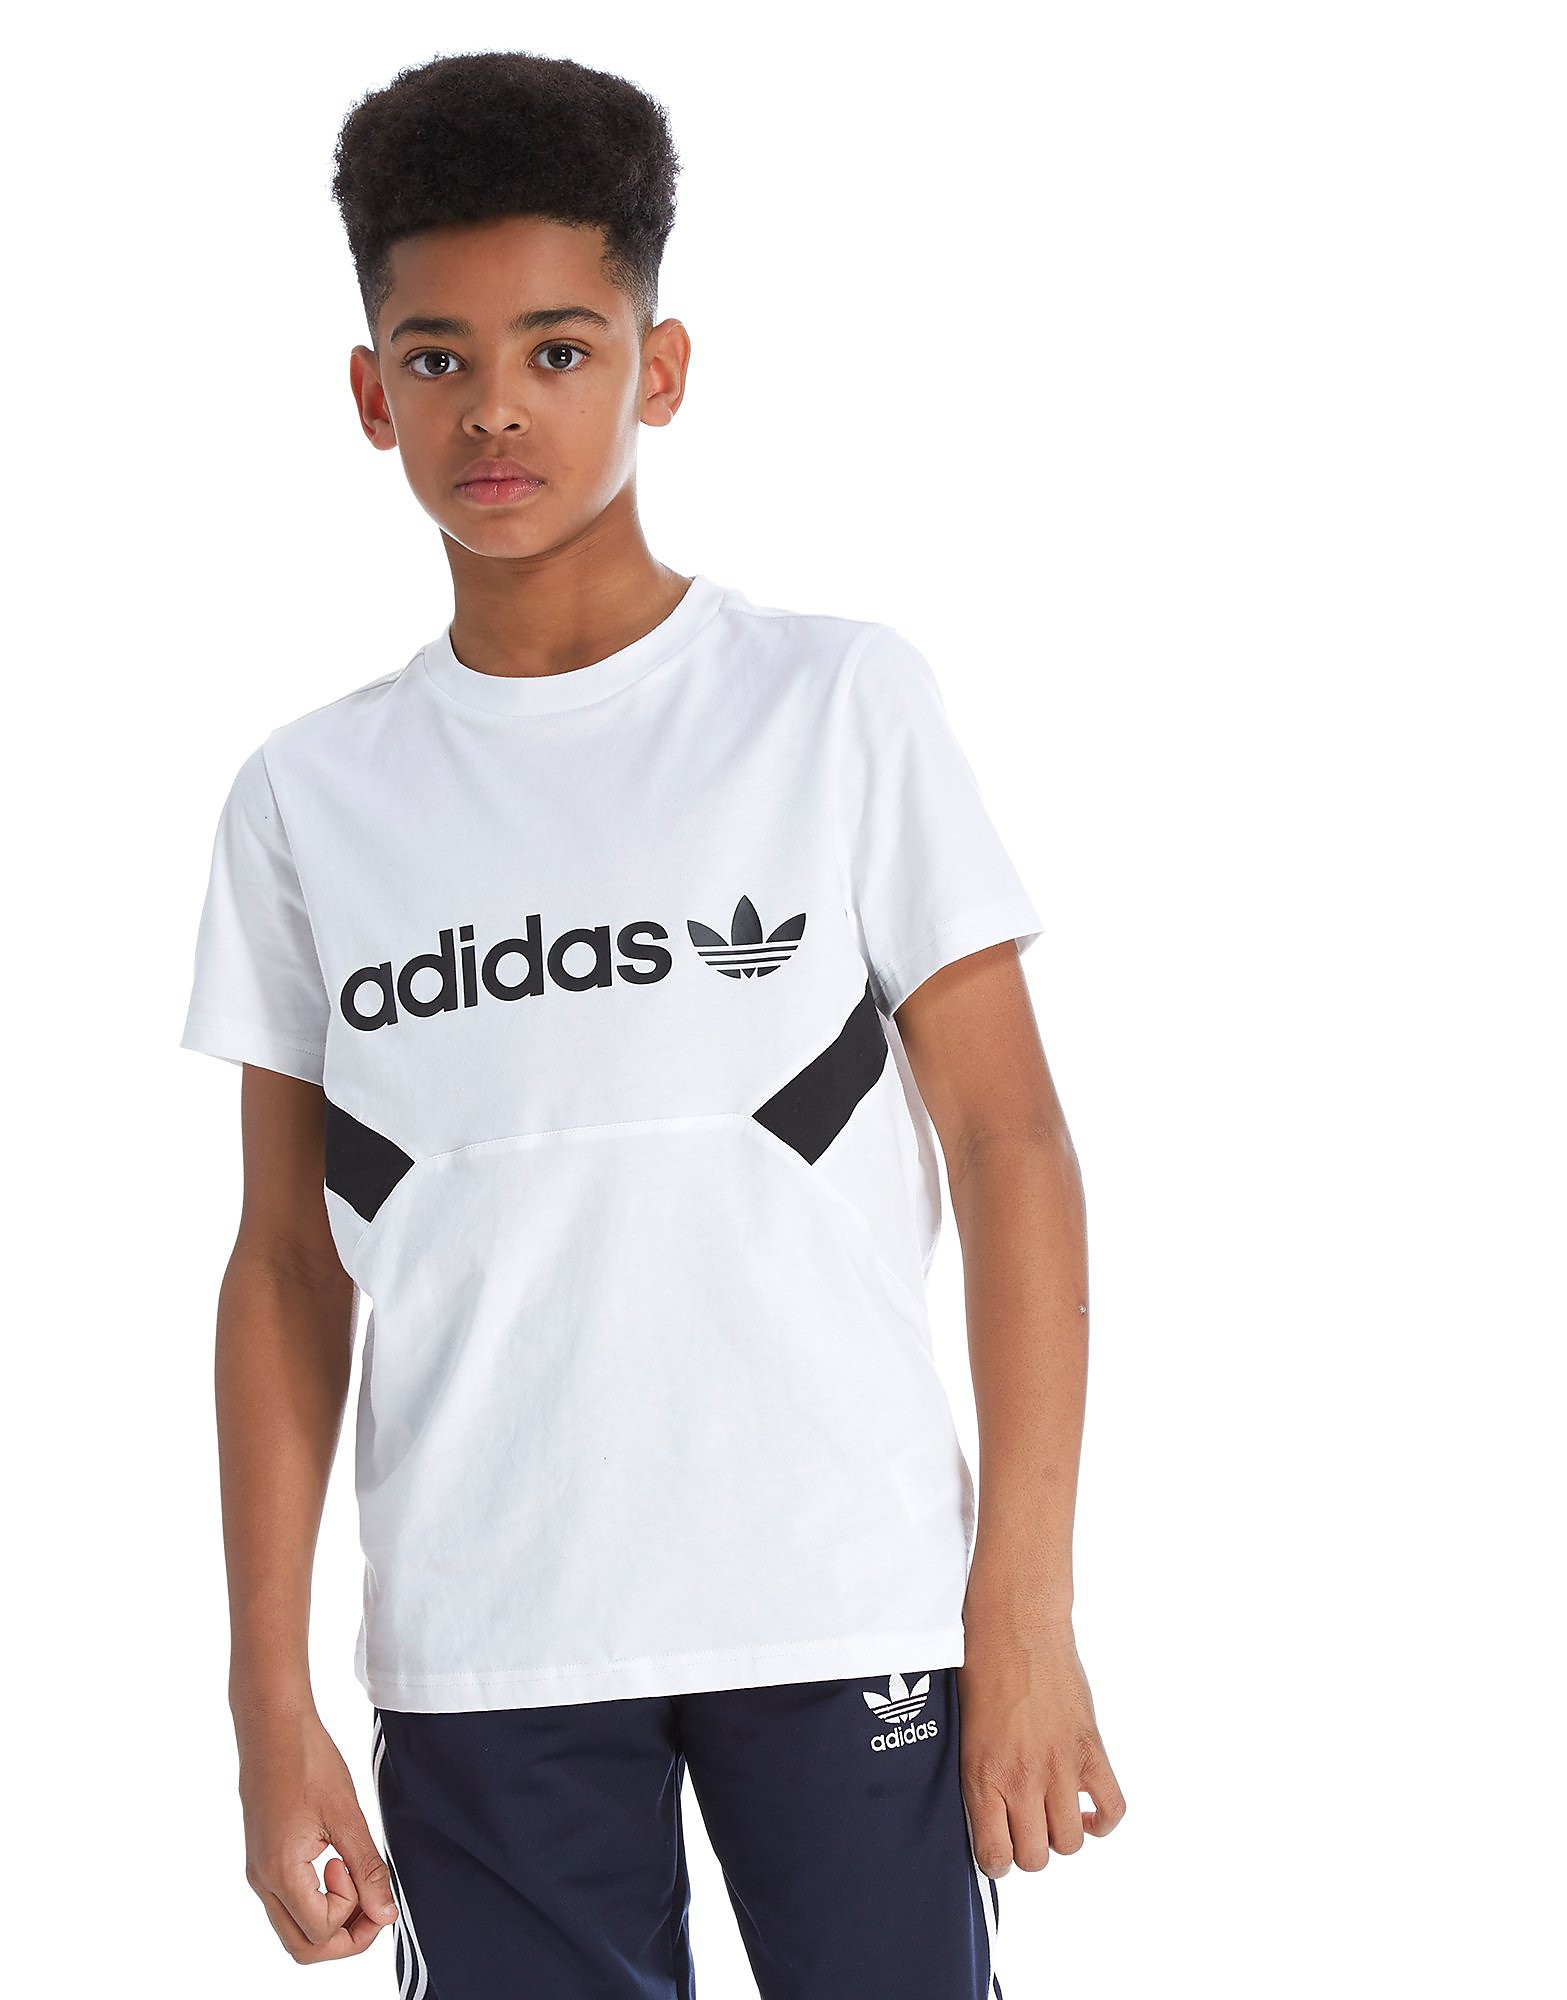 adidas Originals Tref Series T-Shirt